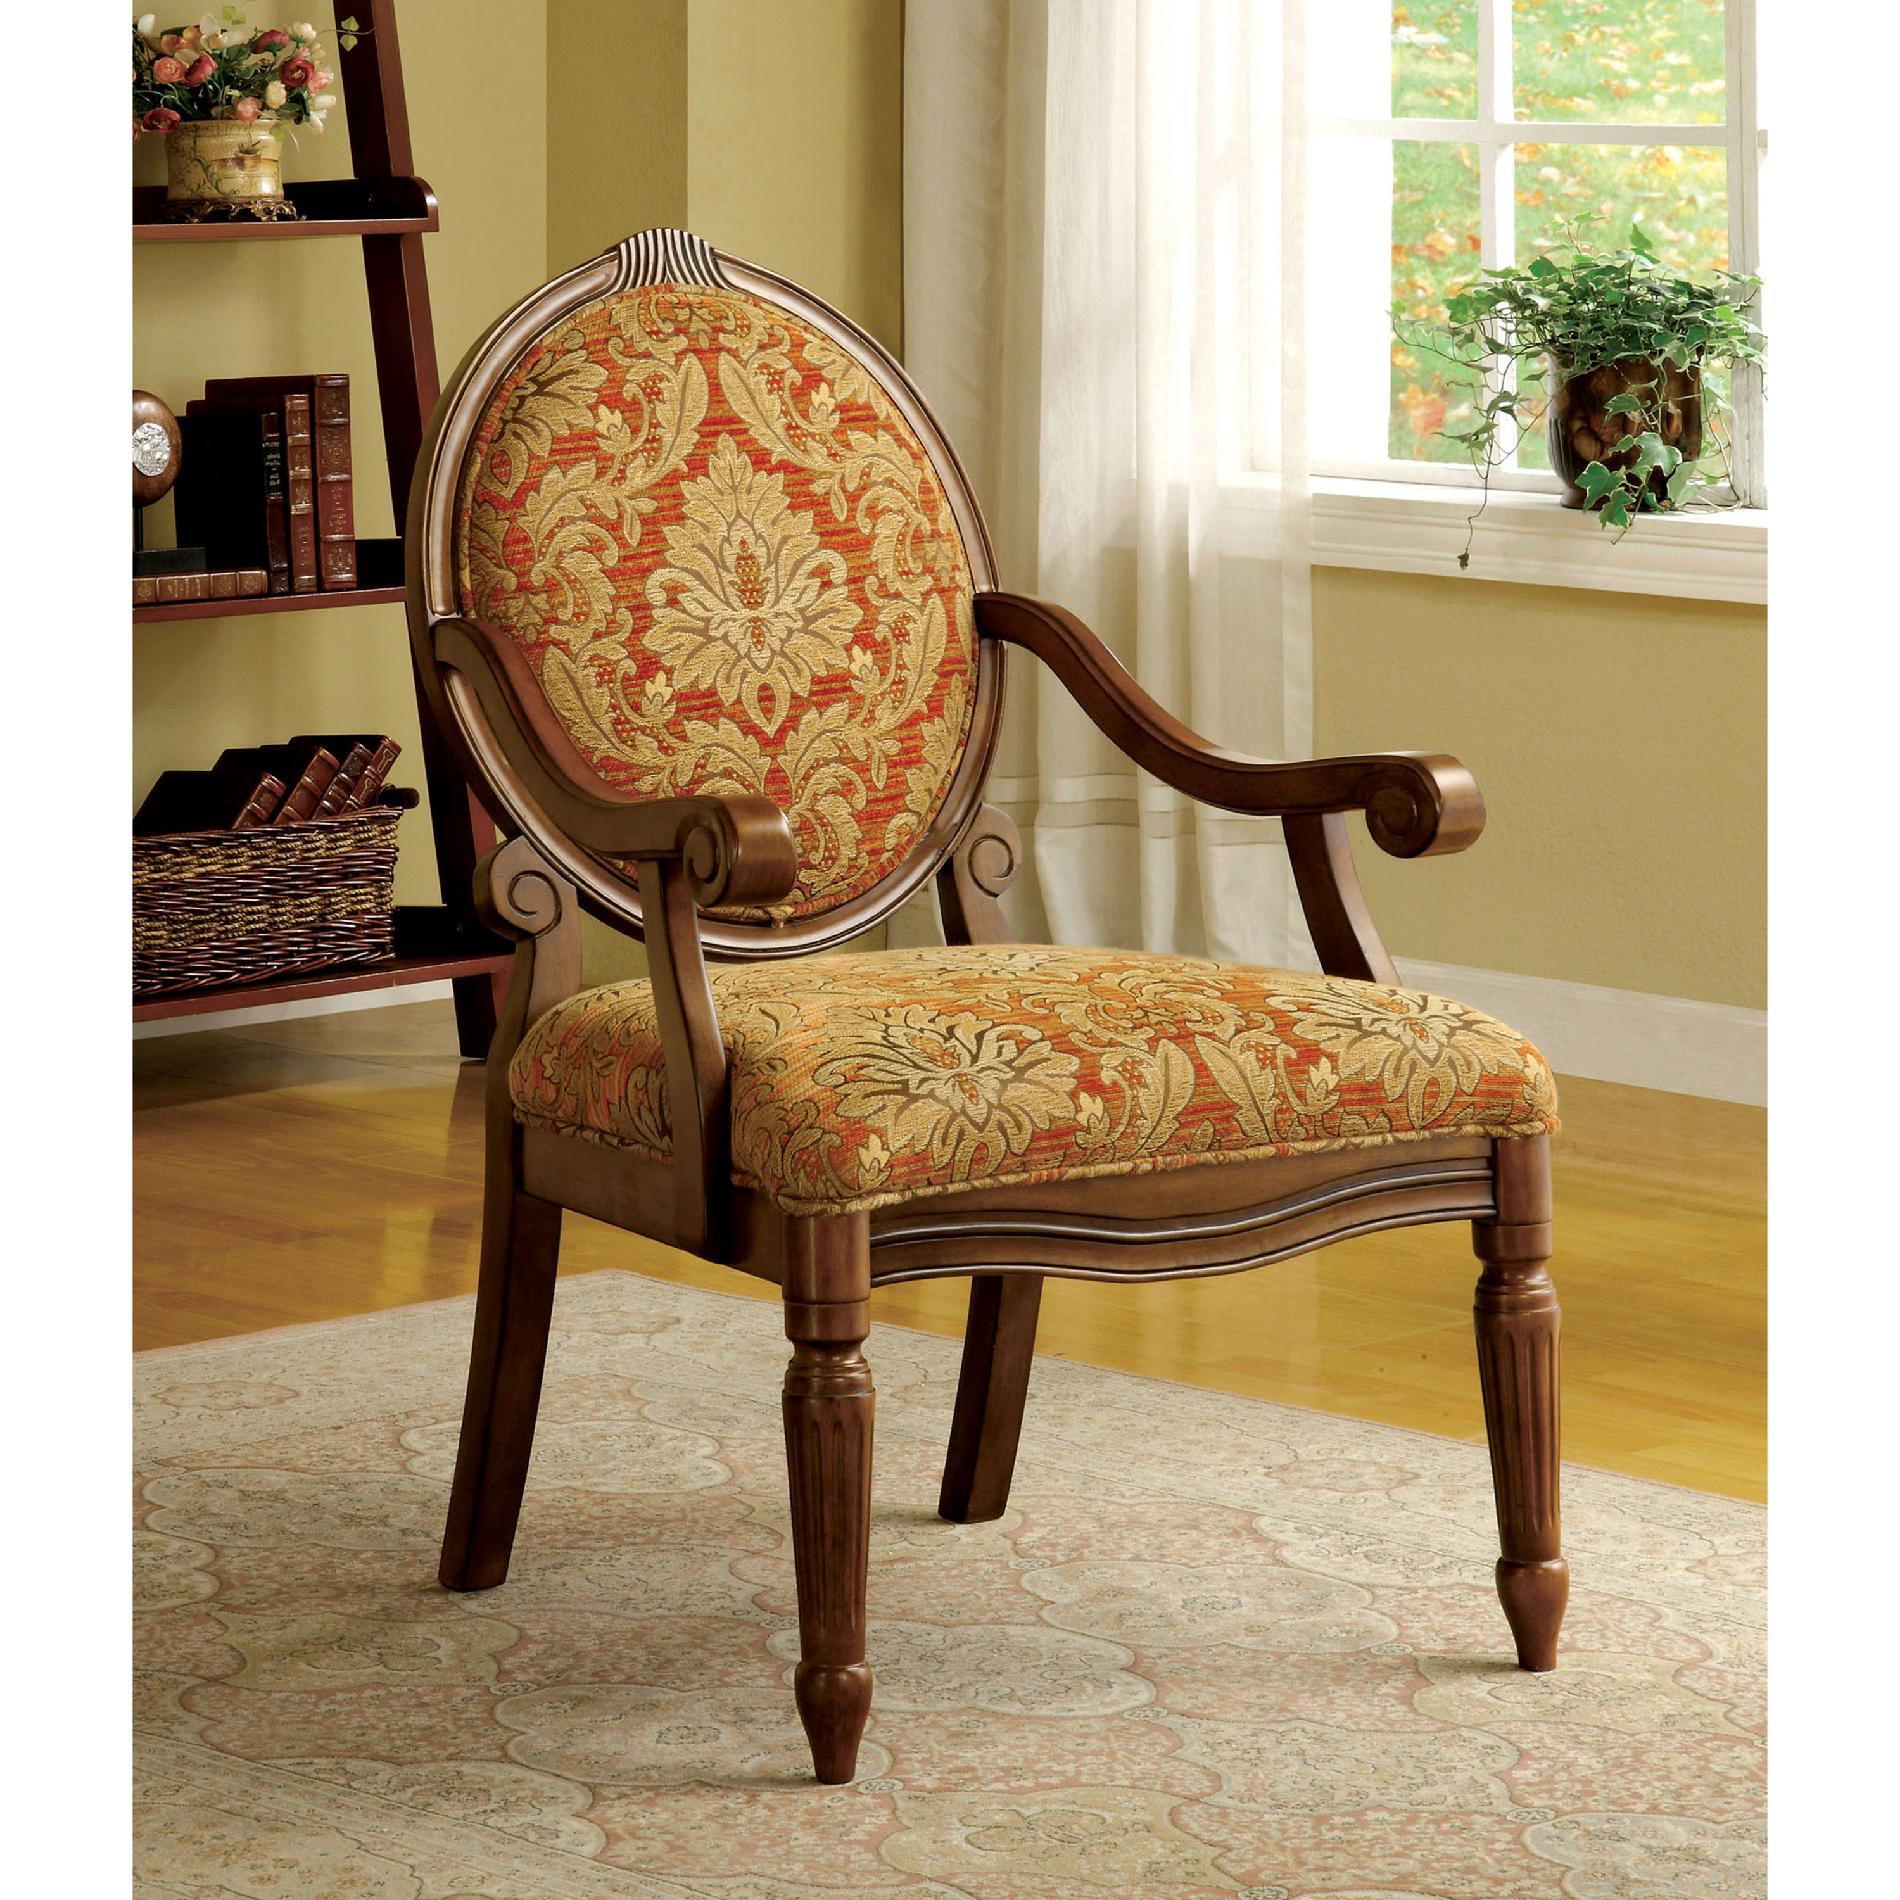 victorian accent chair think stool venetian worldwide hammond